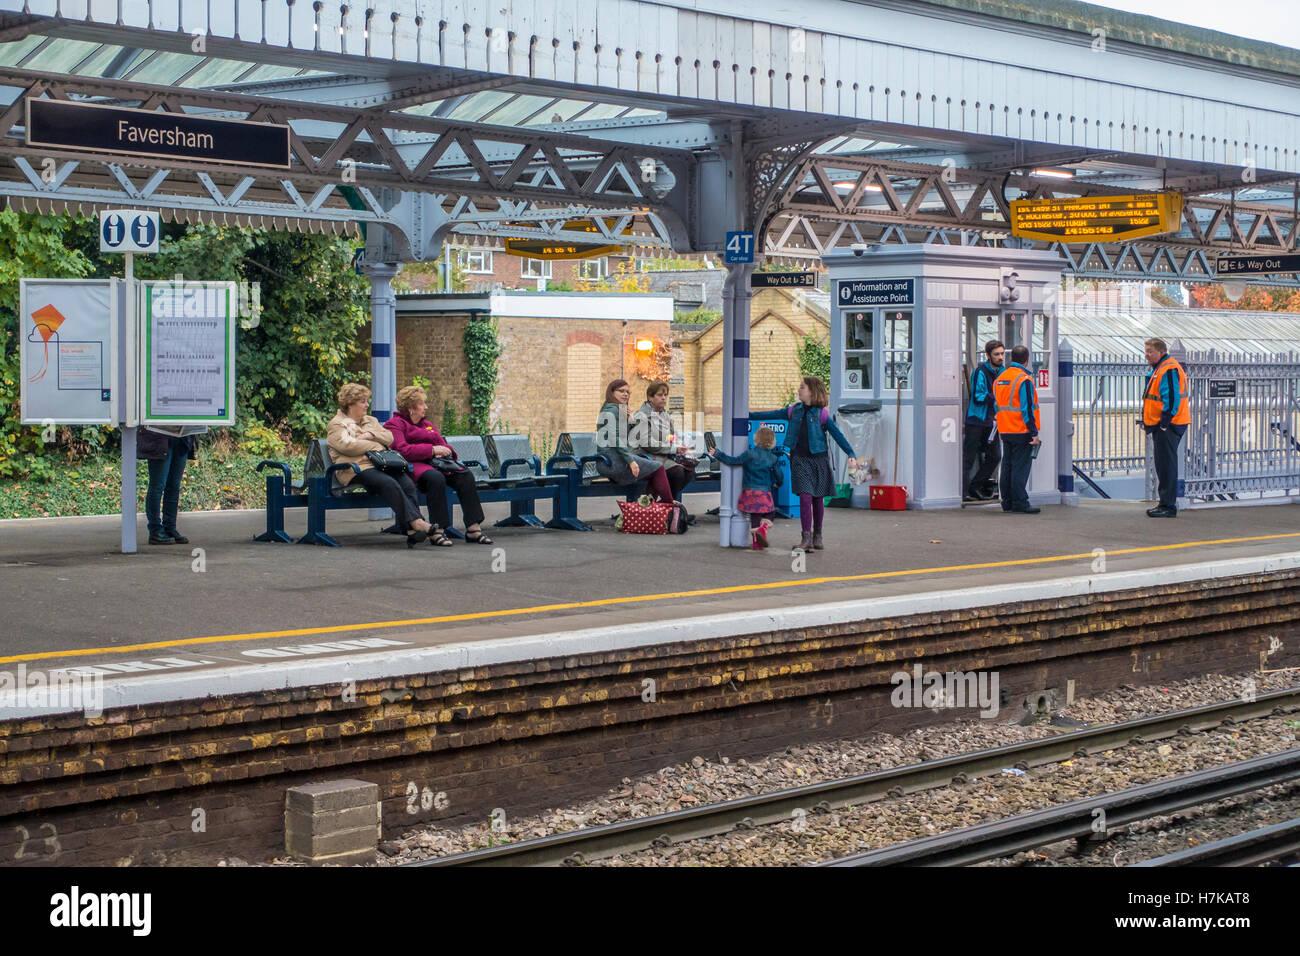 Passengers and Rail Staff Waiting for Train SouthEastern Faversham Station Kent - Stock Image